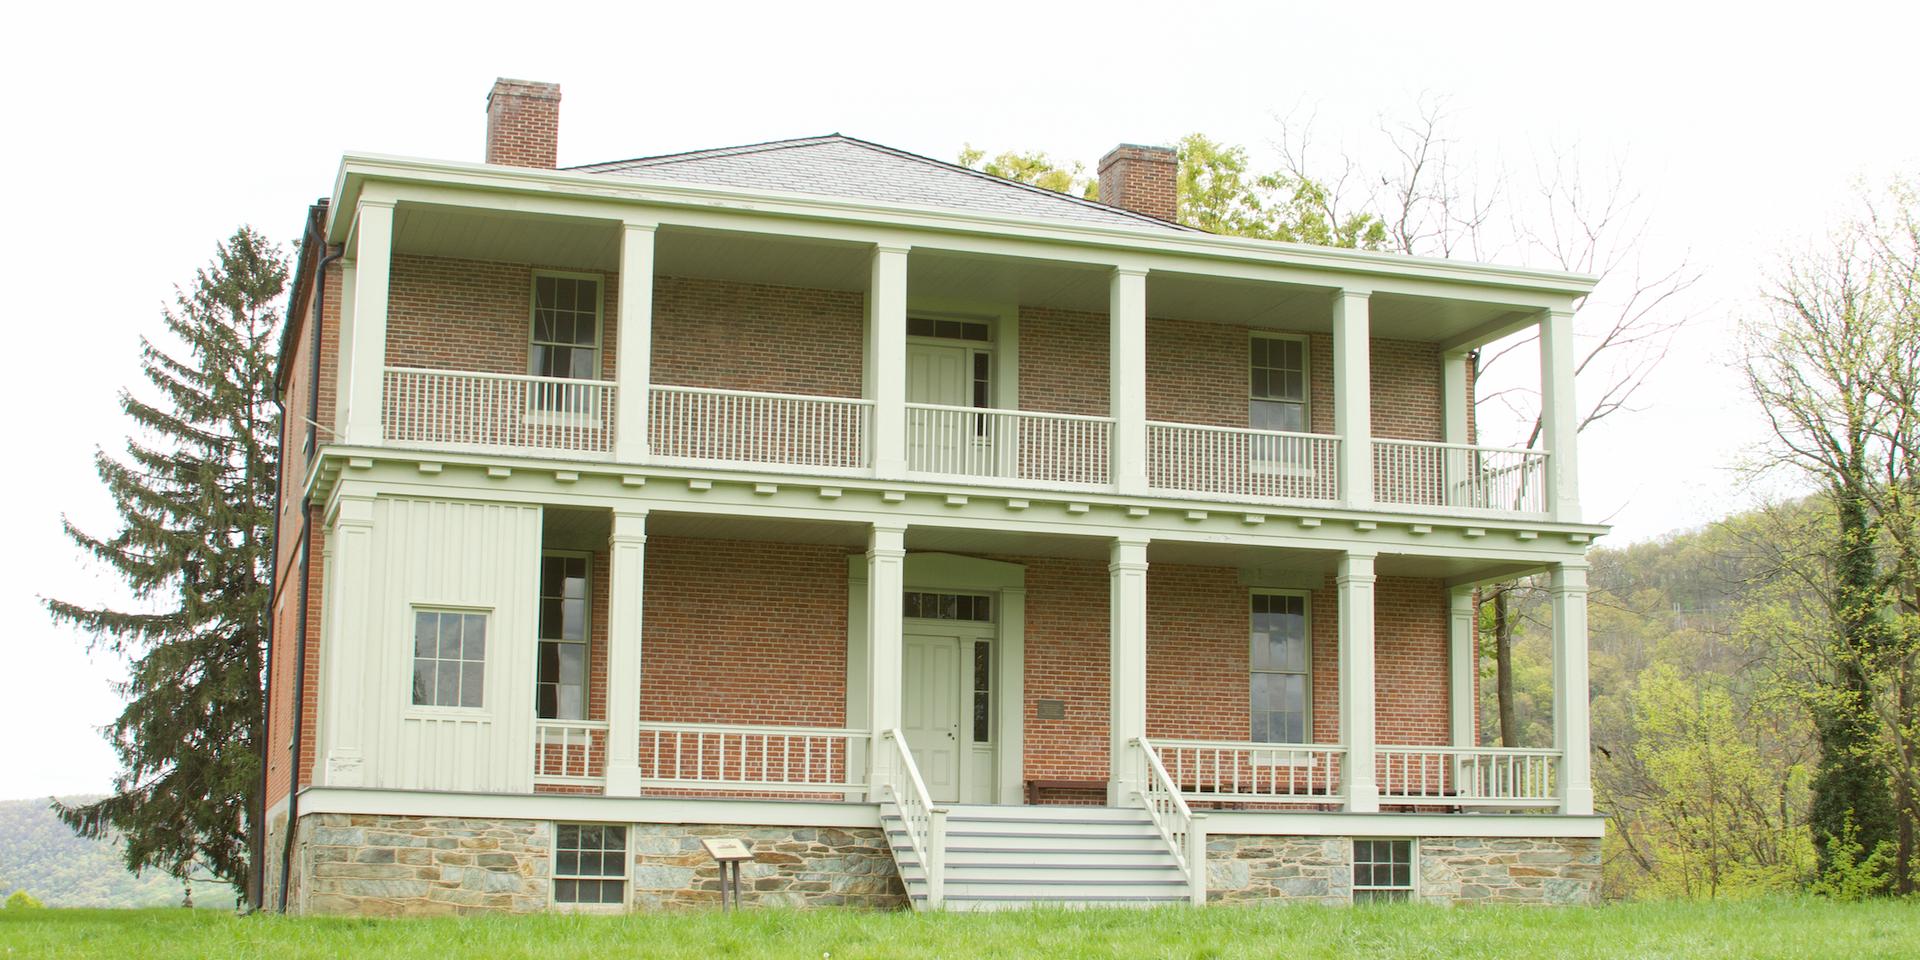 49. Lockwood House entrance   (Photo by G. Maurice Ballard)